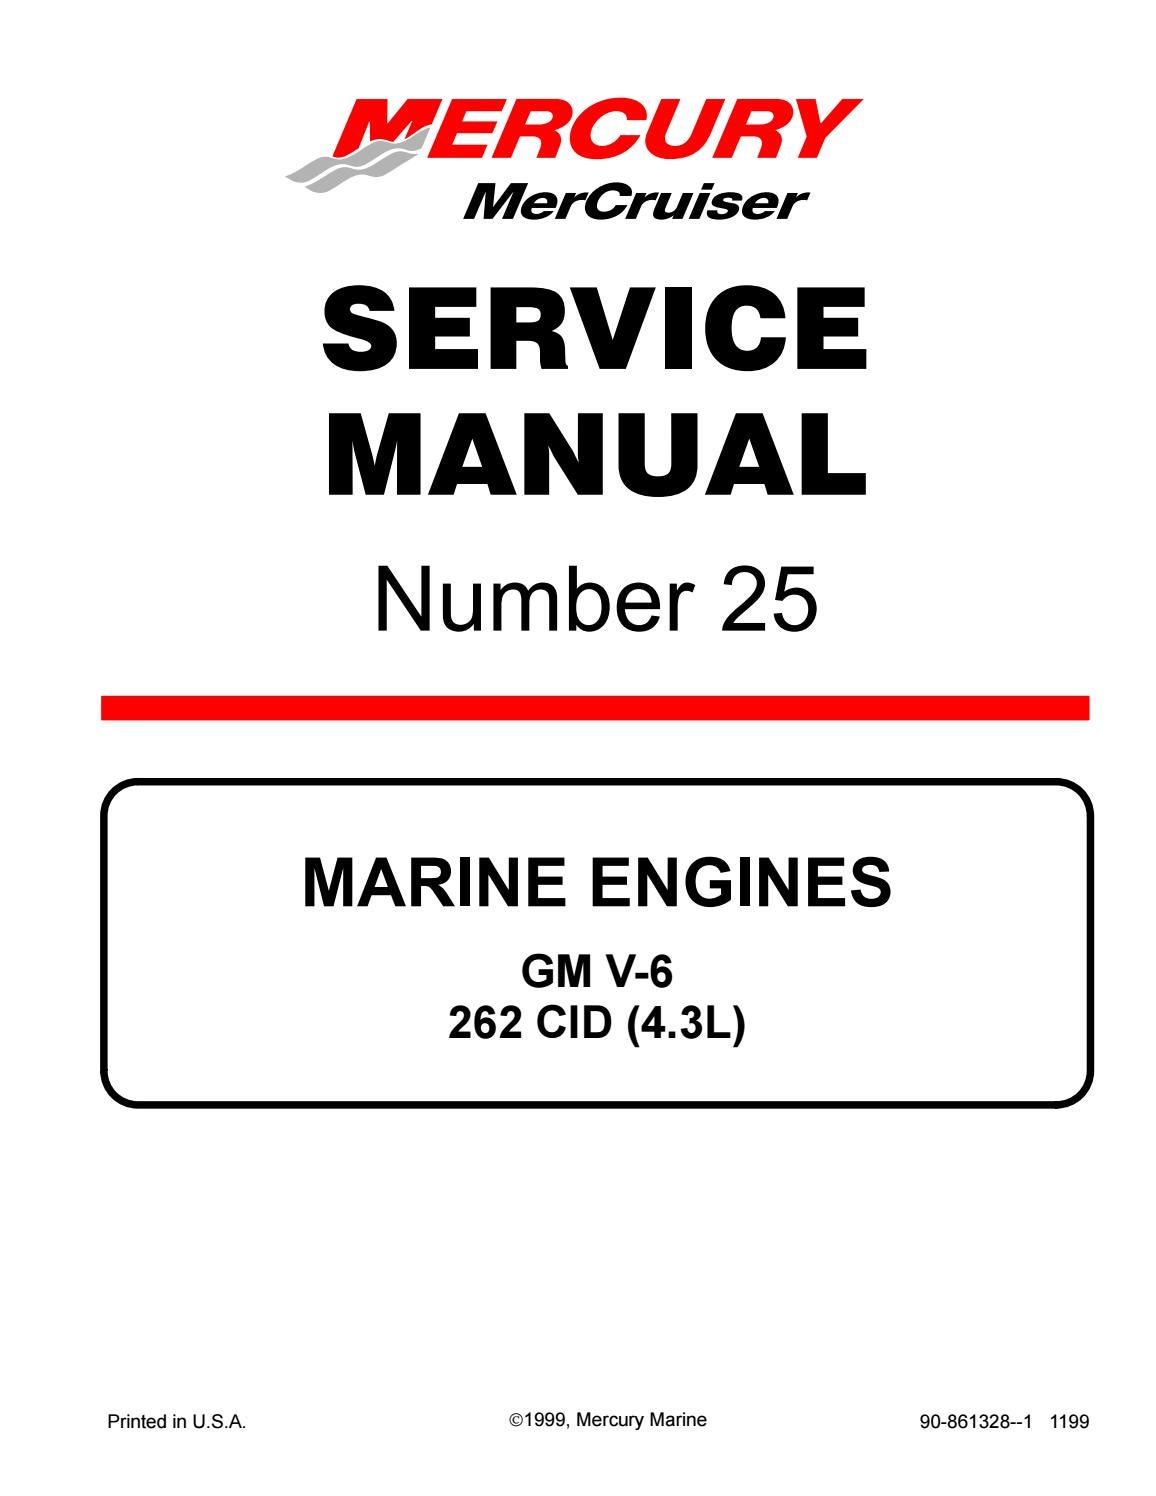 Mercury Mercruiser Marine Engines Gm V6 262 Cid  4 3l